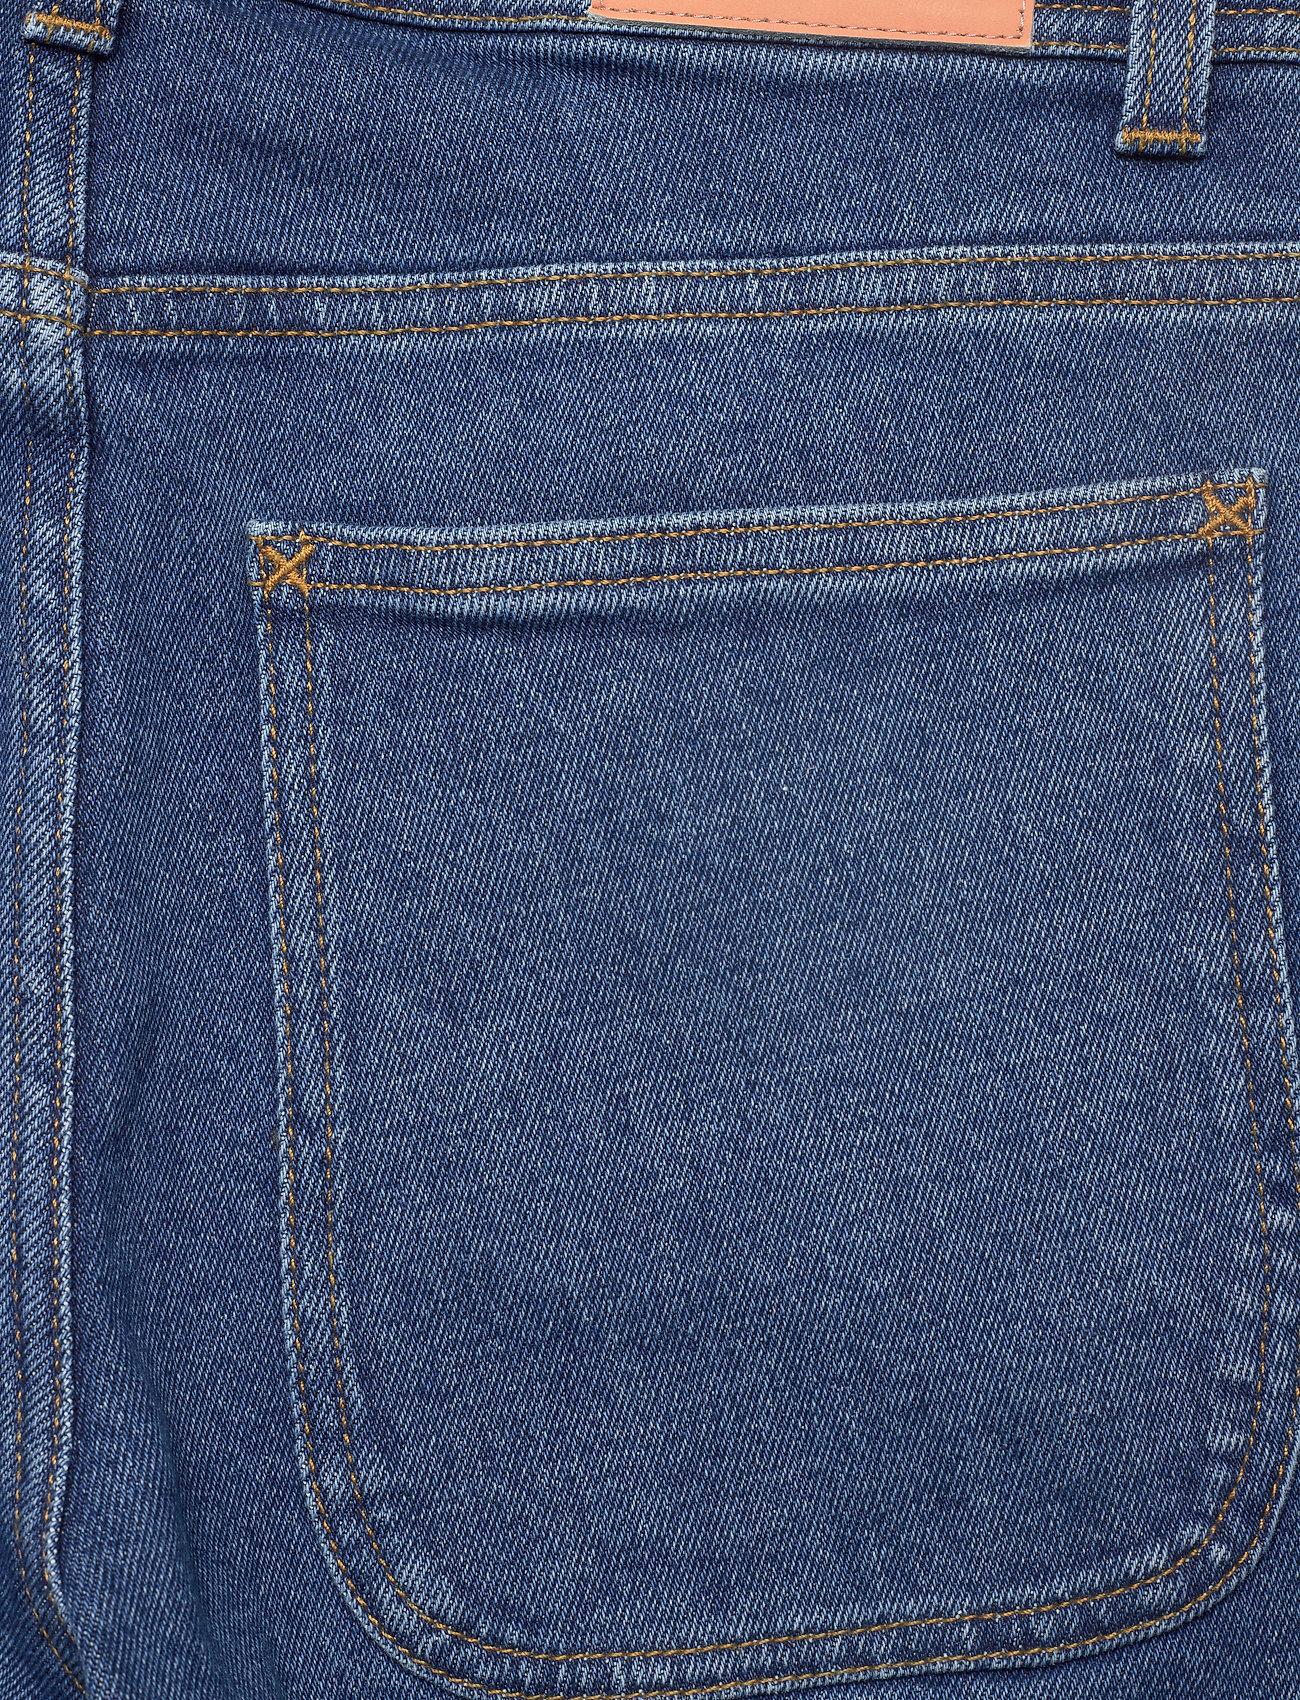 RODEBJER - RODEBJER EDIE - straight jeans - vintage blue - 4